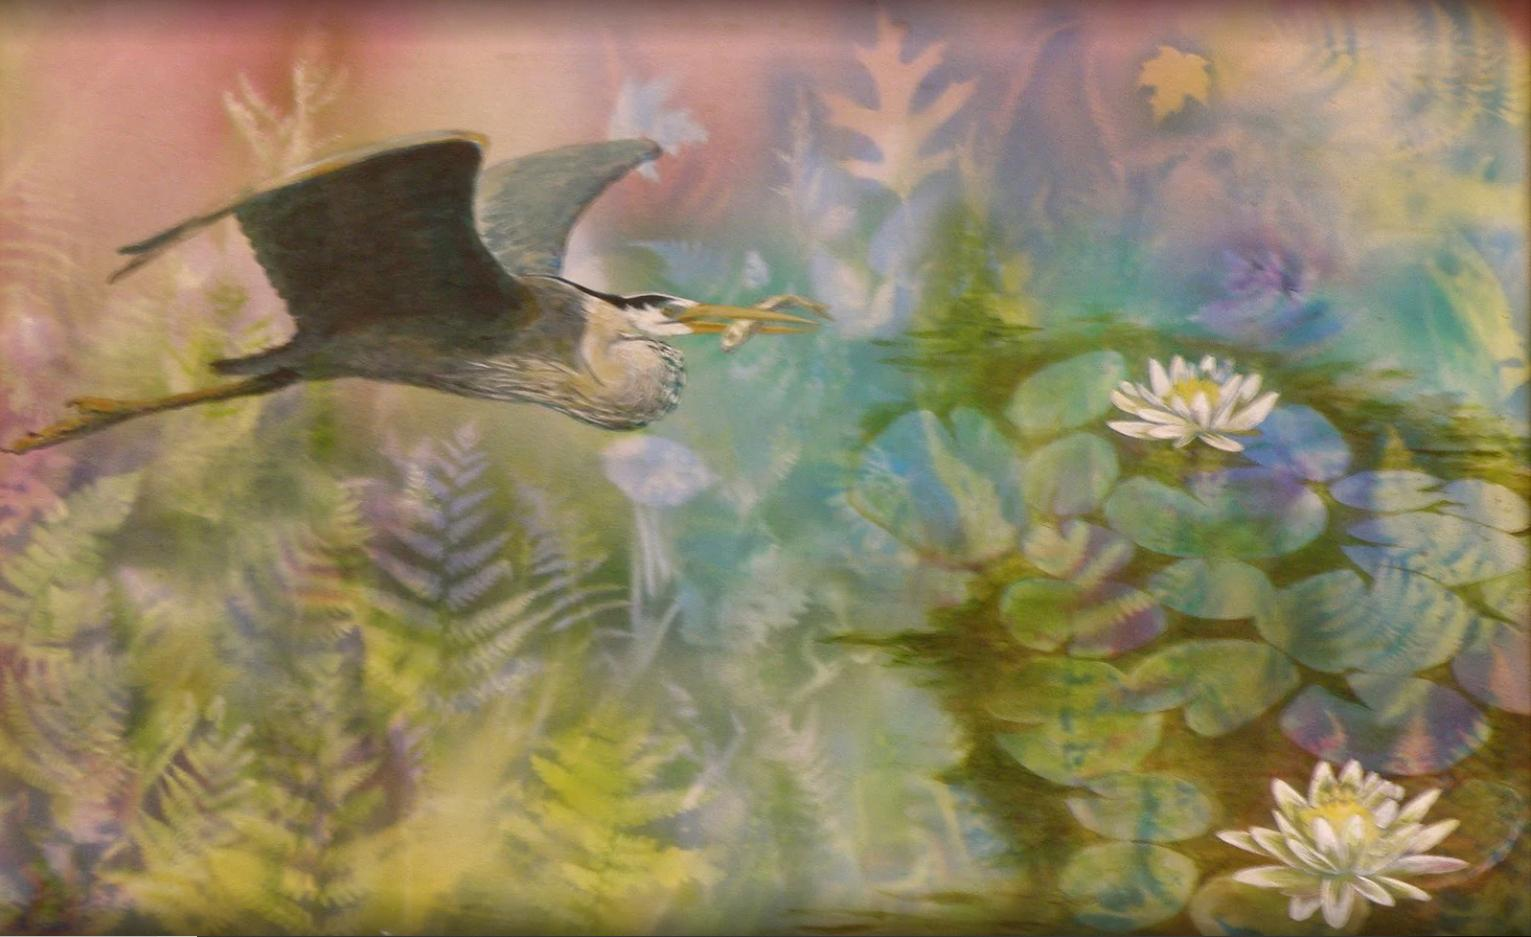 [Heron Flight]